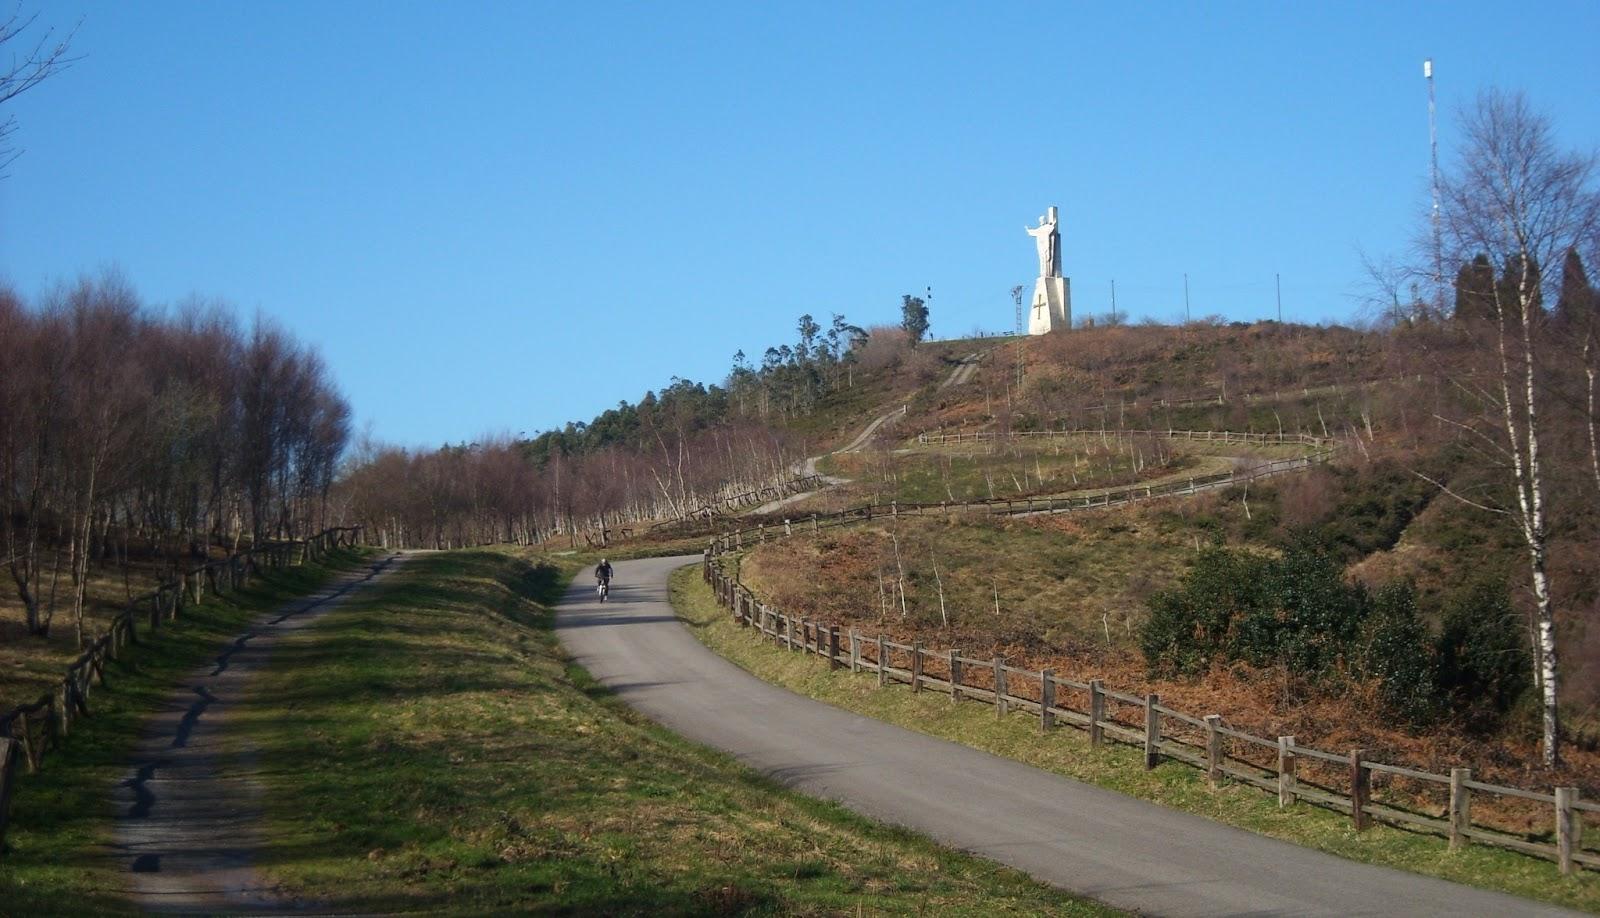 Sagrado Corazon de Jesus en Monte Naranco, Oviedo